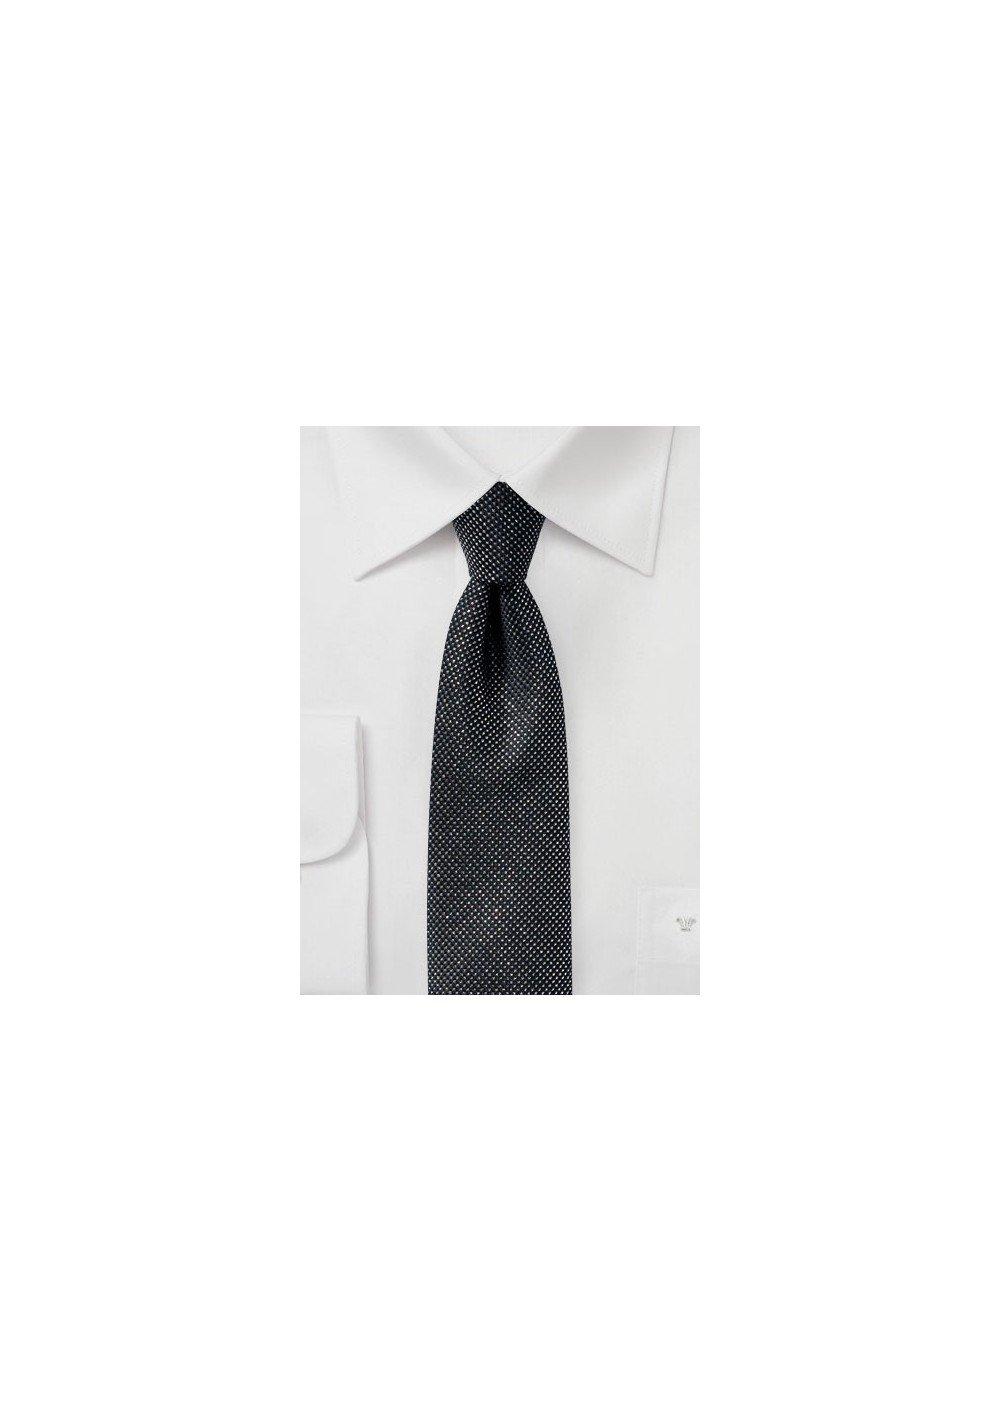 Black Skinny Tie with Metallic Sparkles